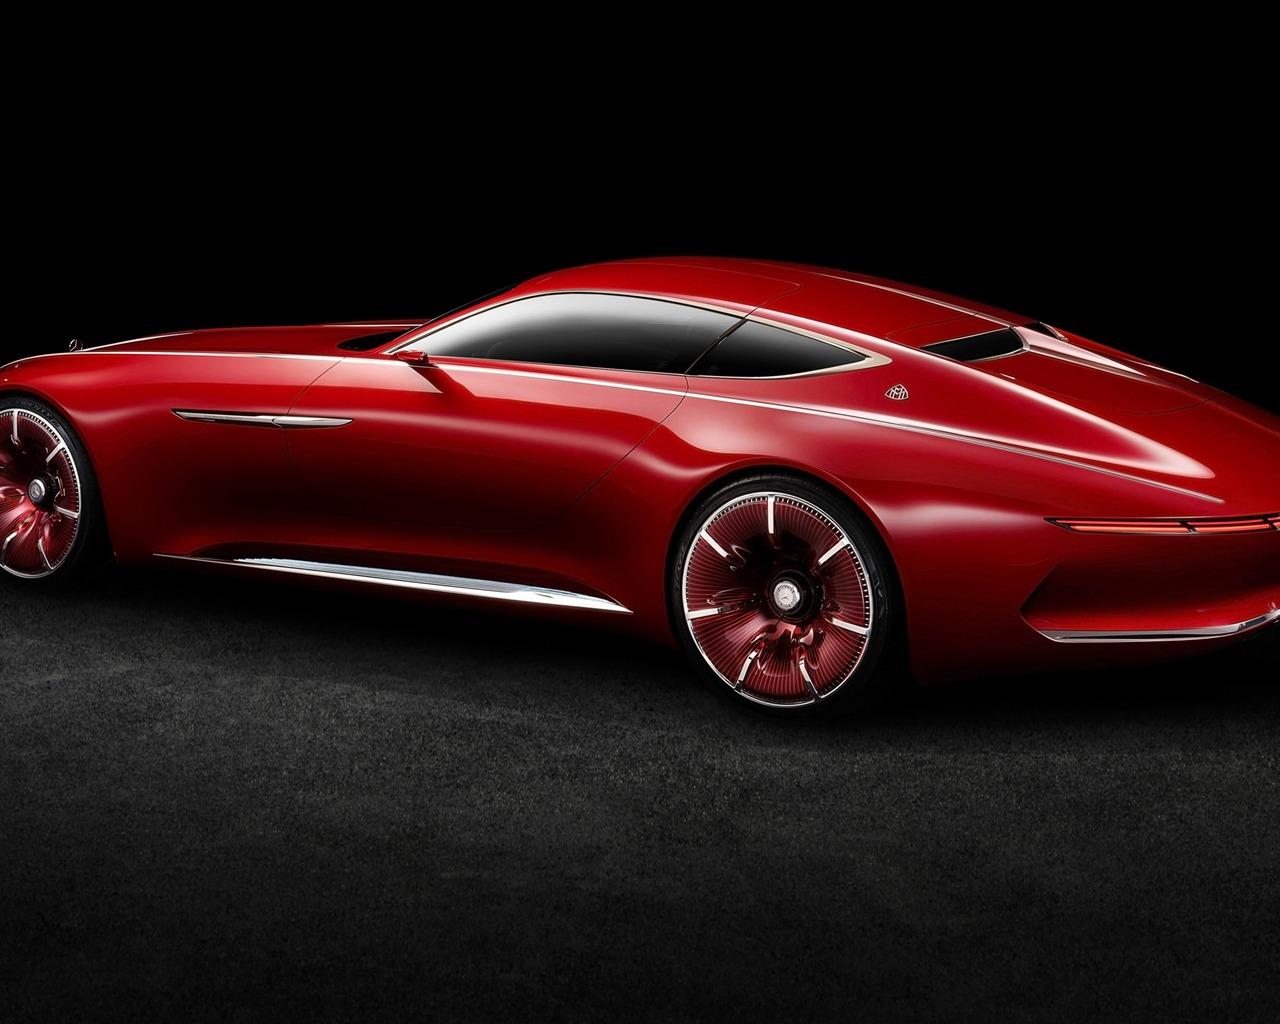 Mercedes Amg Gtr >> 2016 视觉梅赛德斯·迈巴赫6概念车高清桌面壁纸预览 | 10wallpaper.com